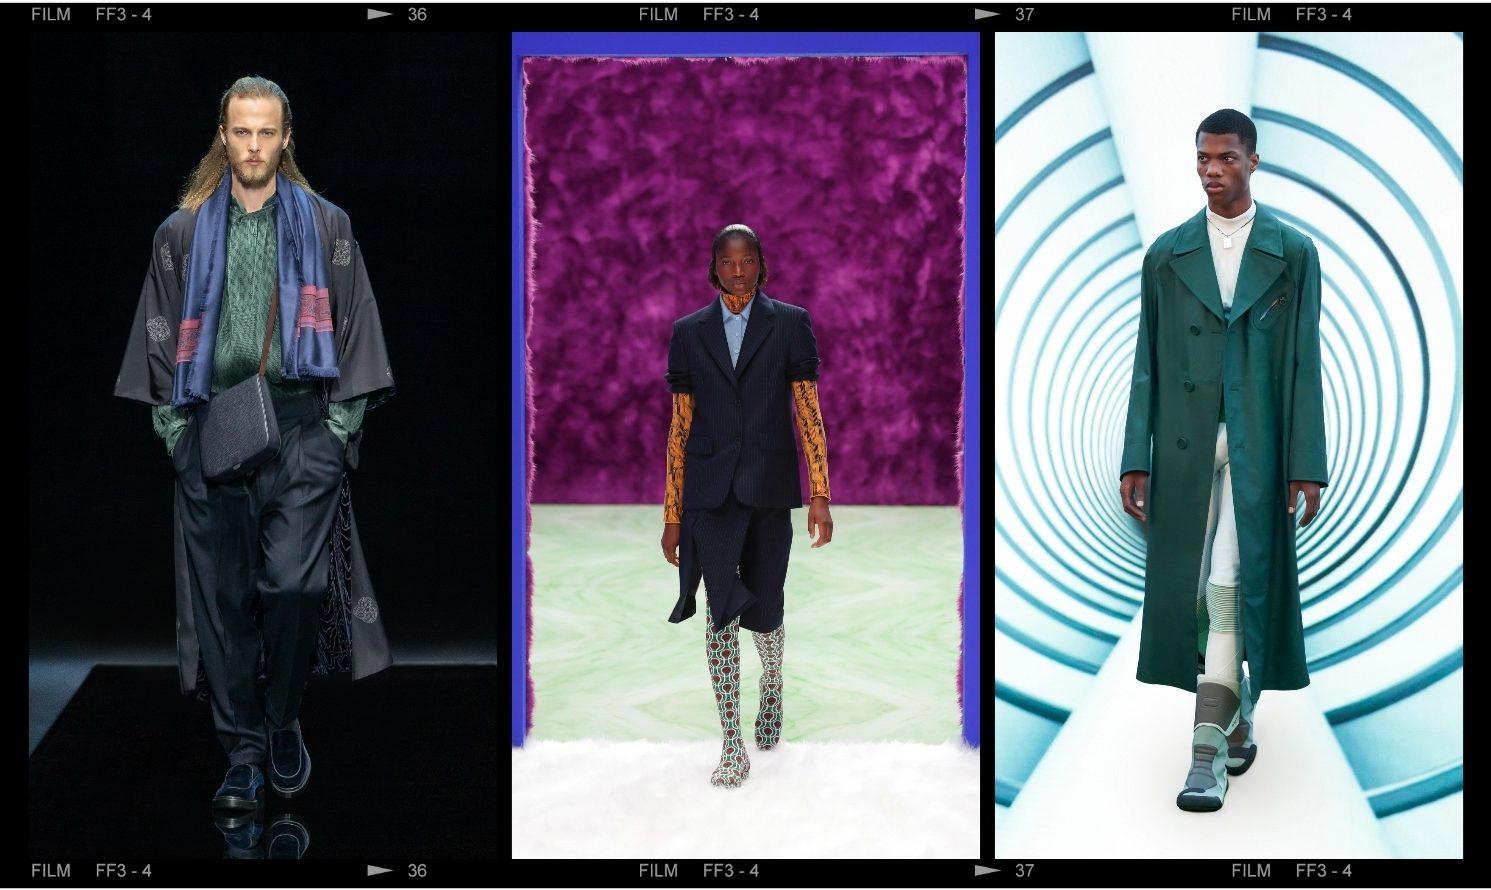 Milan Fashion Week – a new statement of freedom